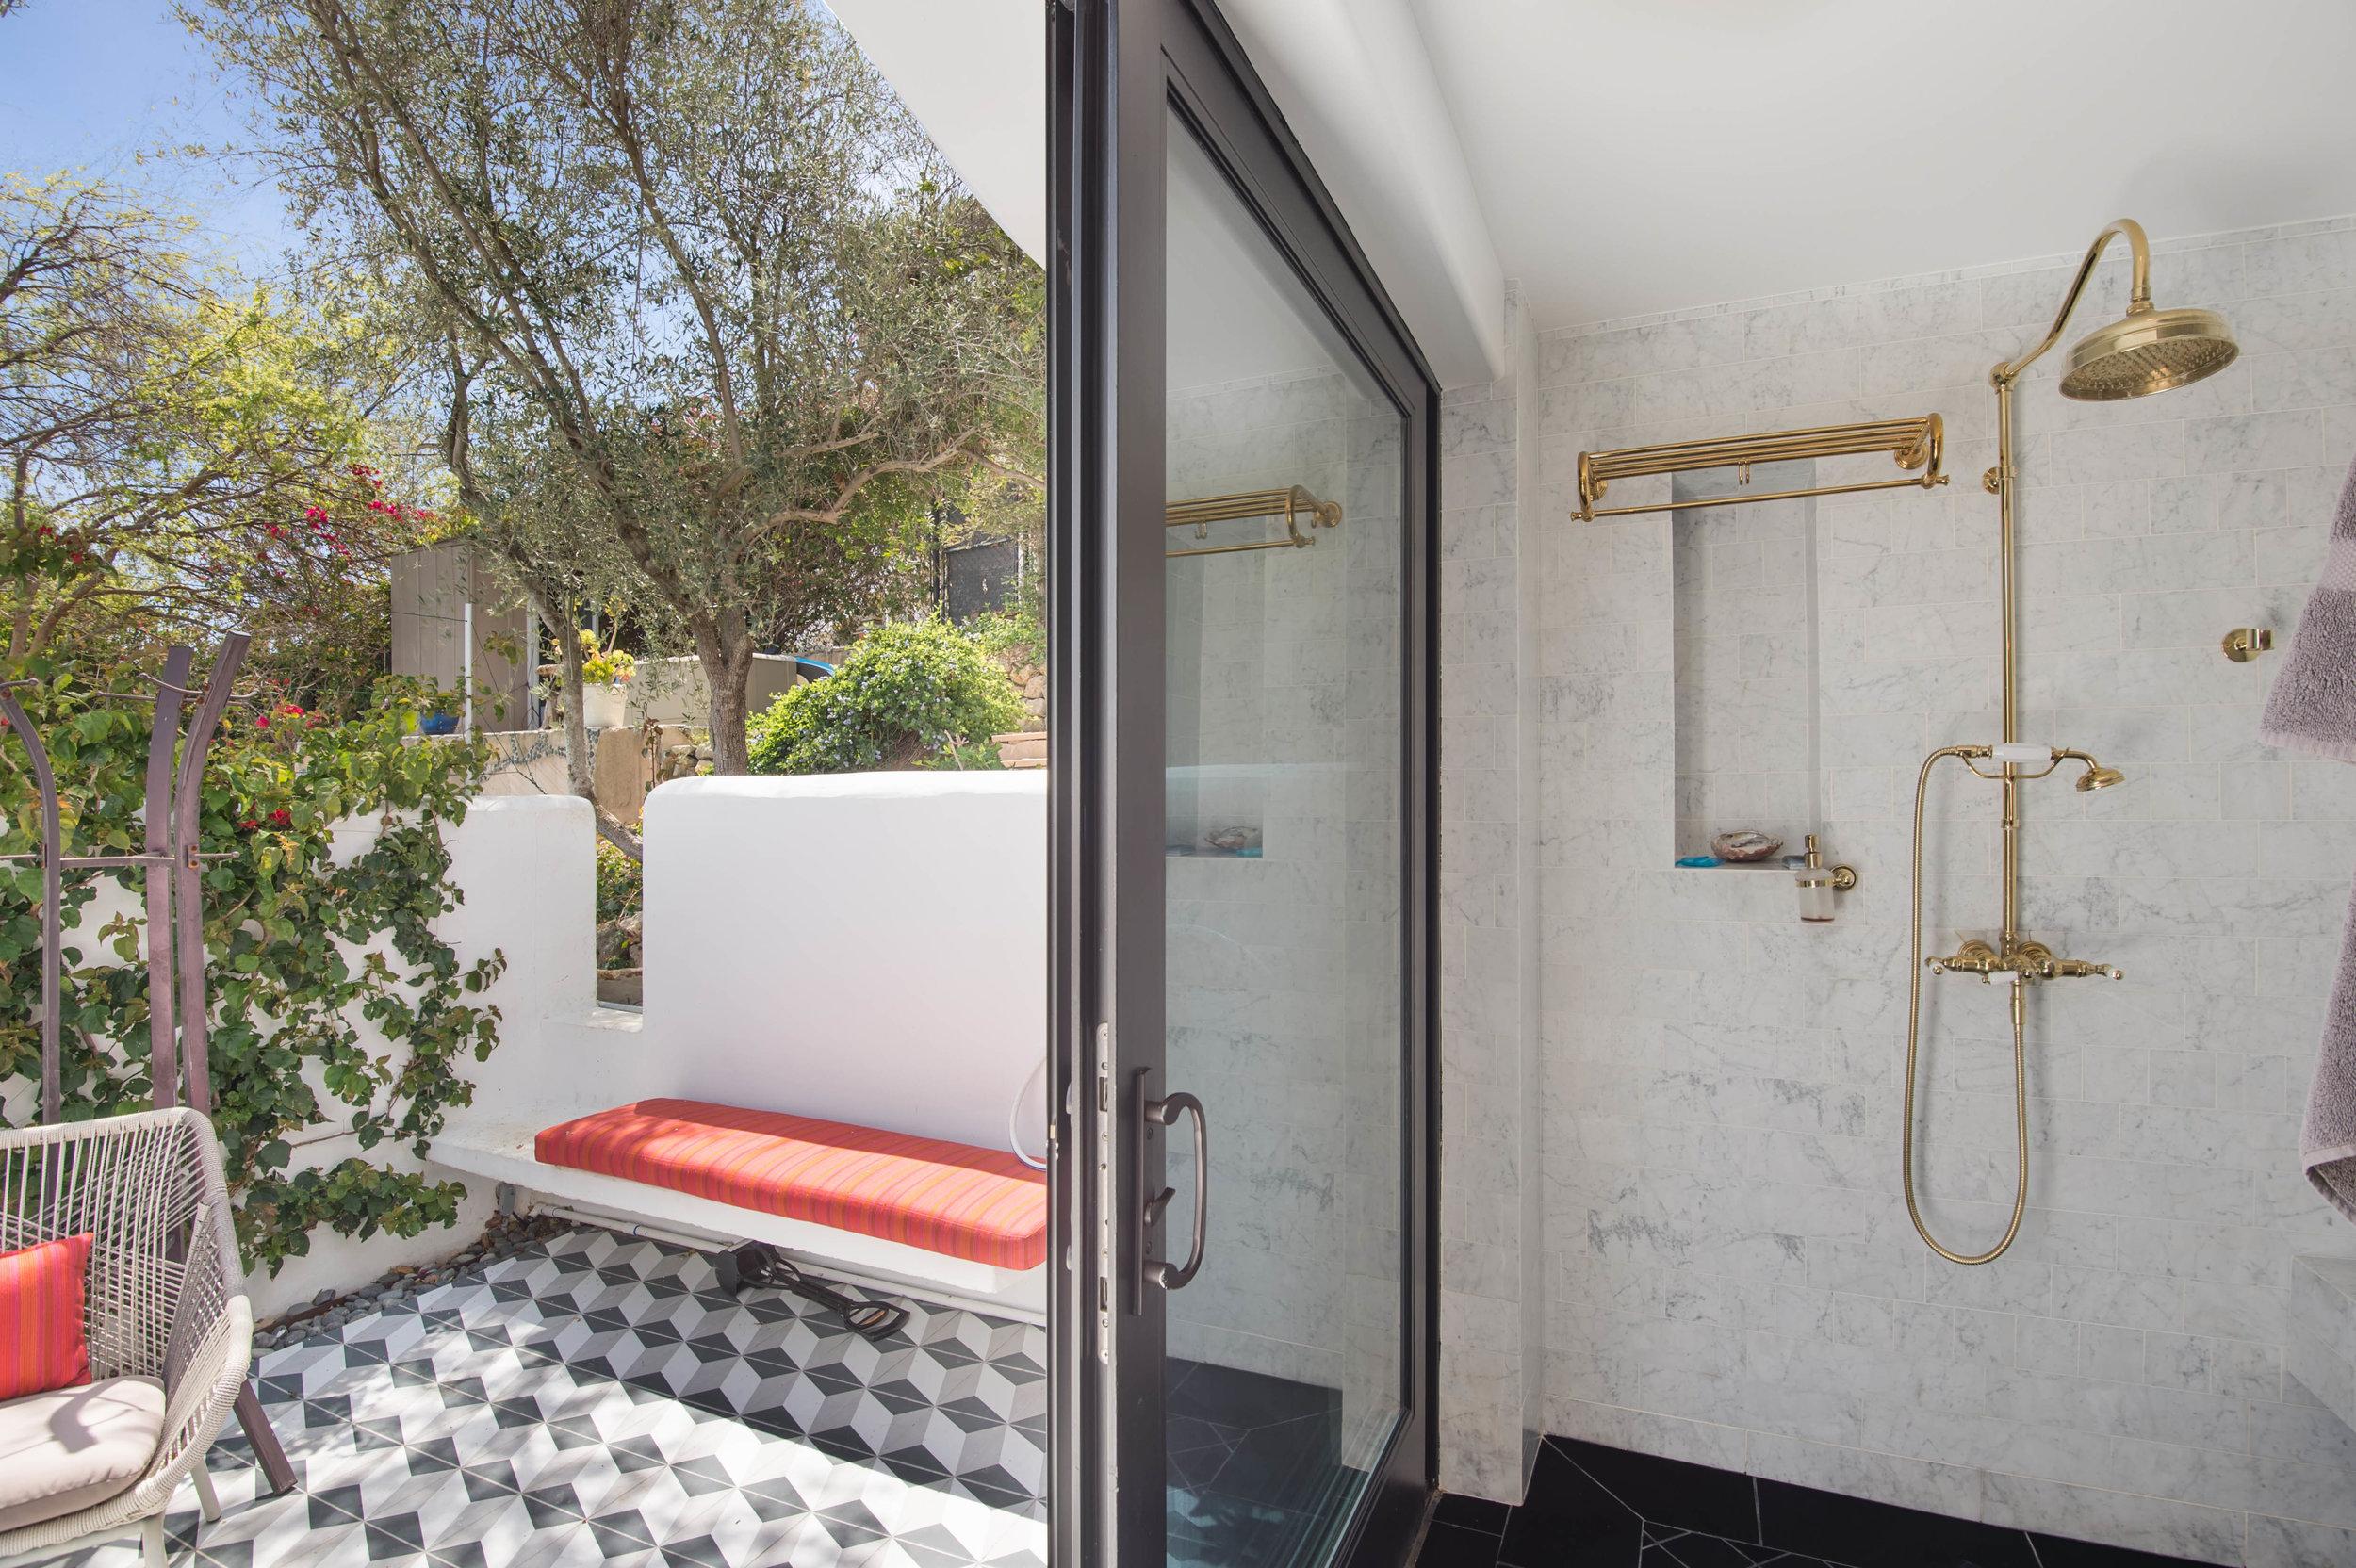 021 Bathroom 26272 Cool Glen Way Malibu For Sale Luxury Real Estate.jpg